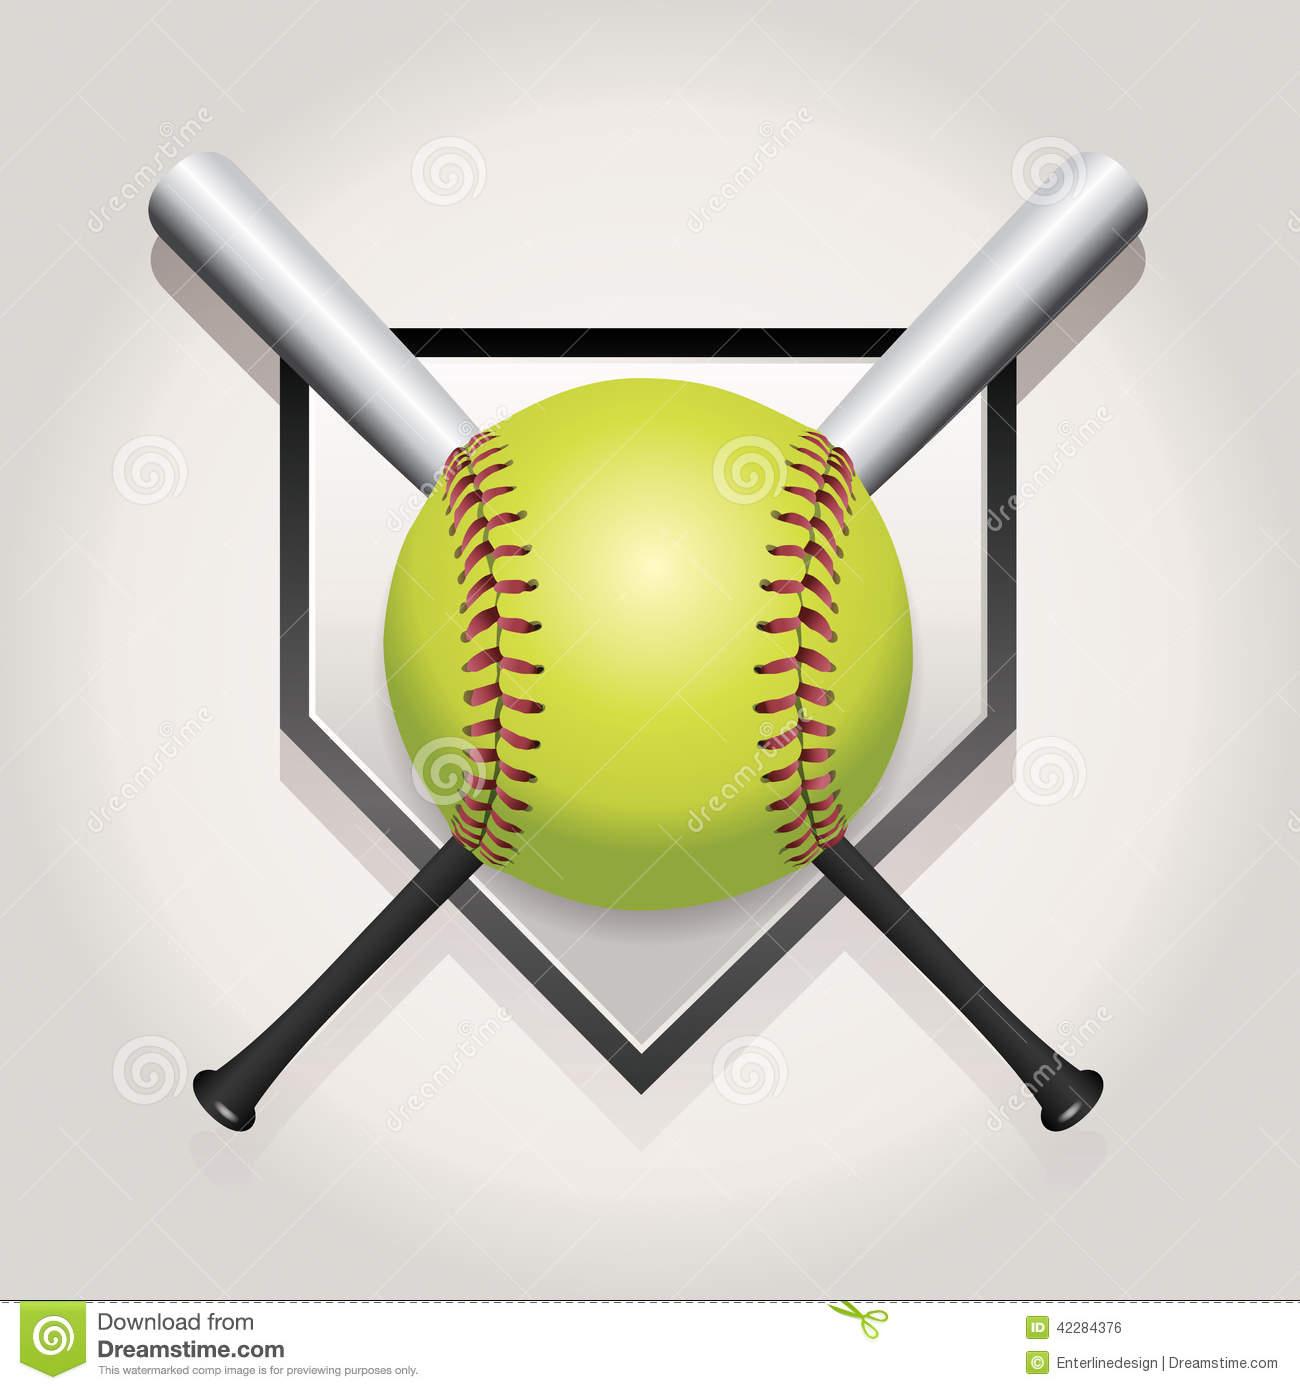 Softball Stock Illustrations – 6,216 Softball Stock Illustrations - Free Printable Softball Images